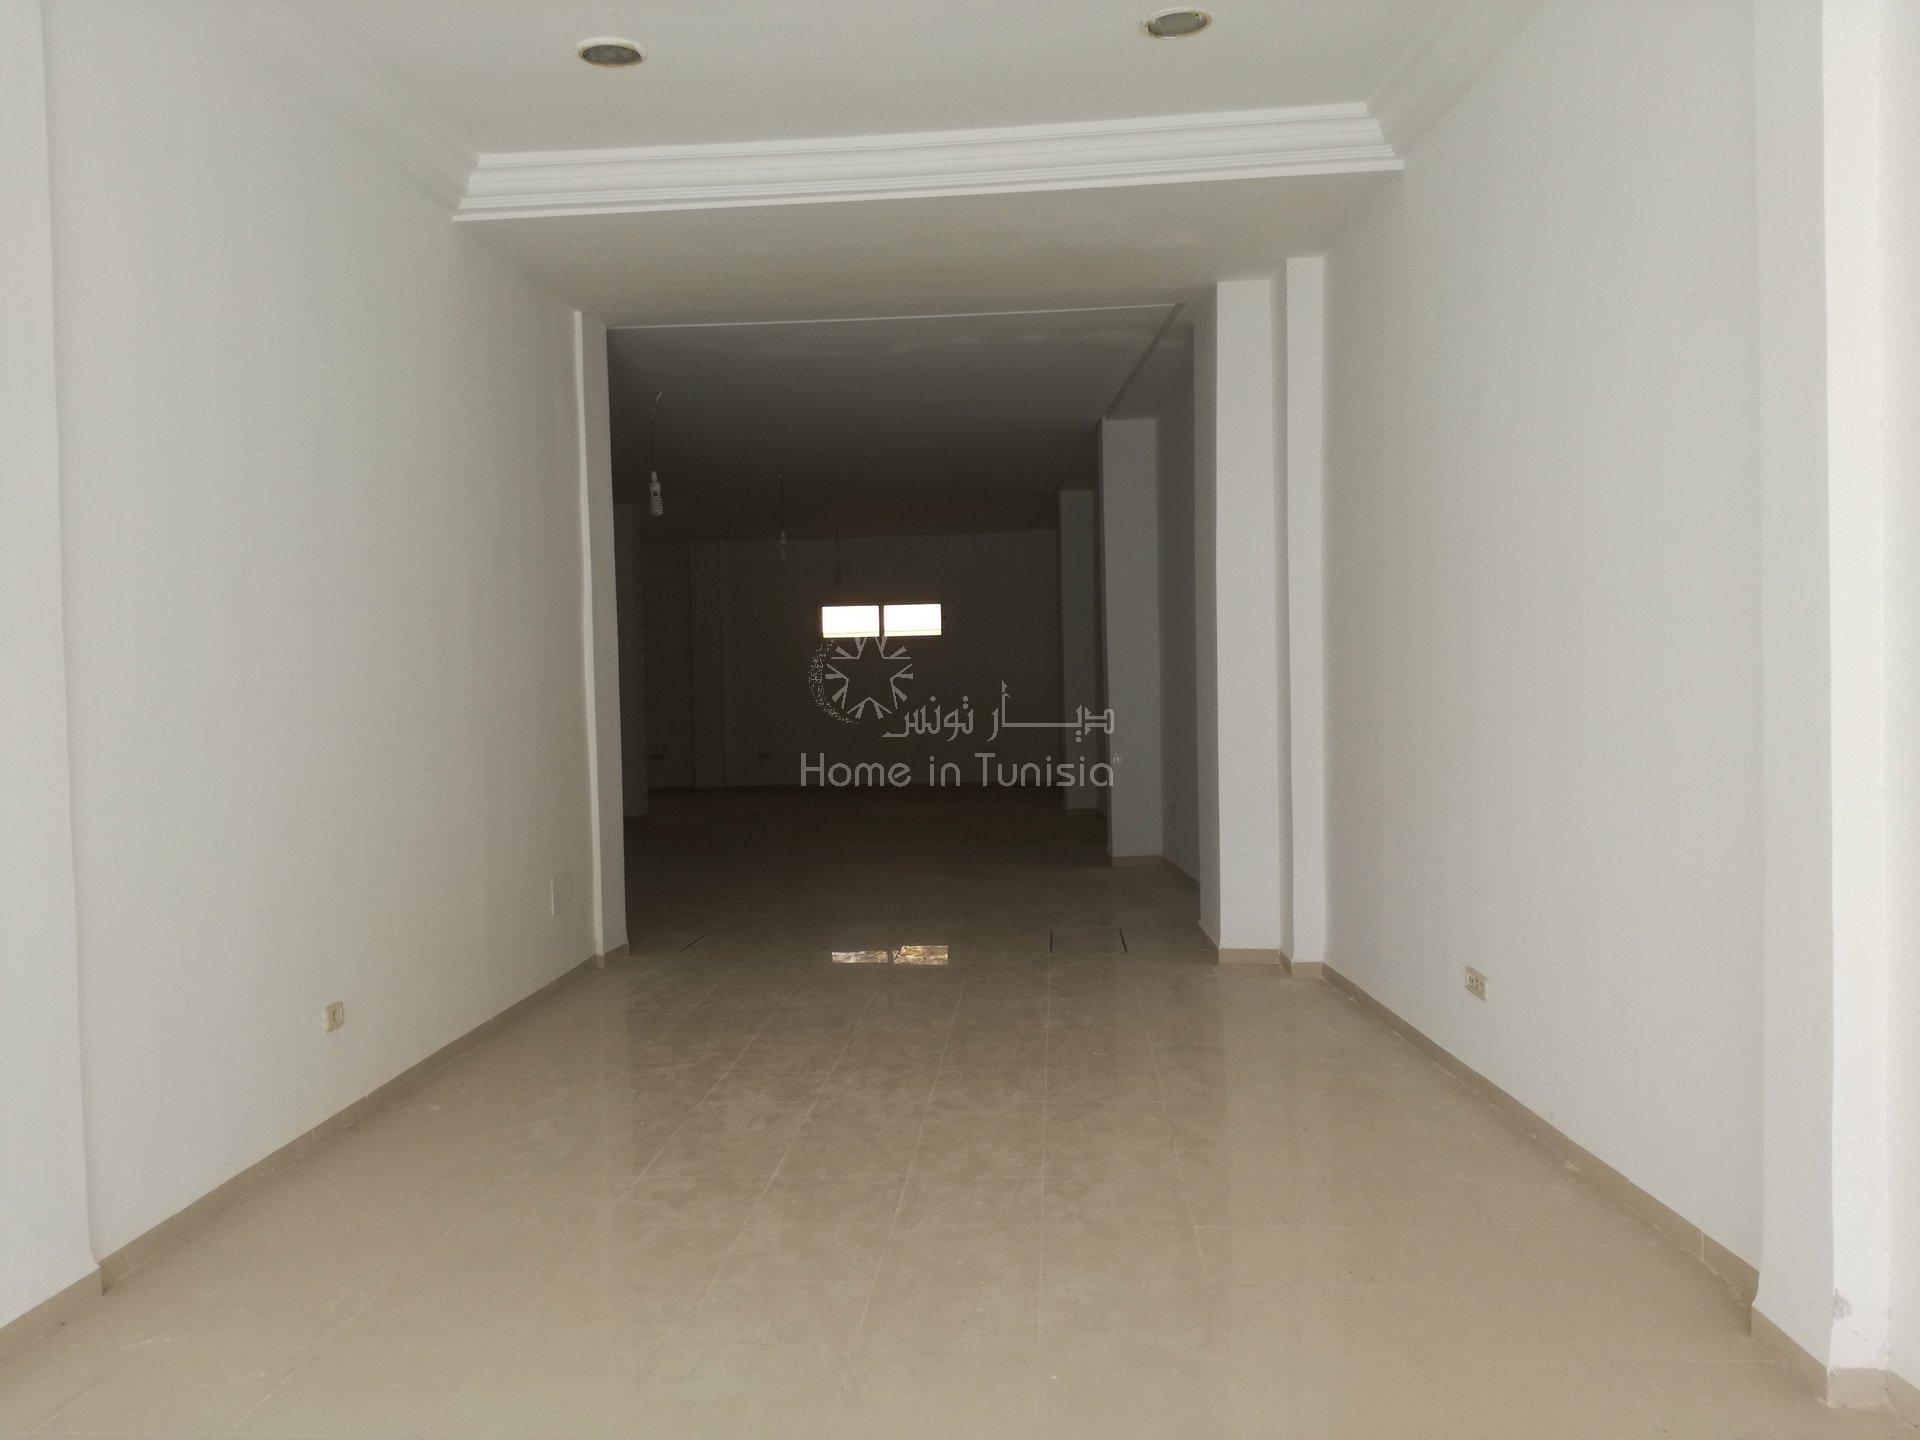 local de 175 m² a usage bureautique